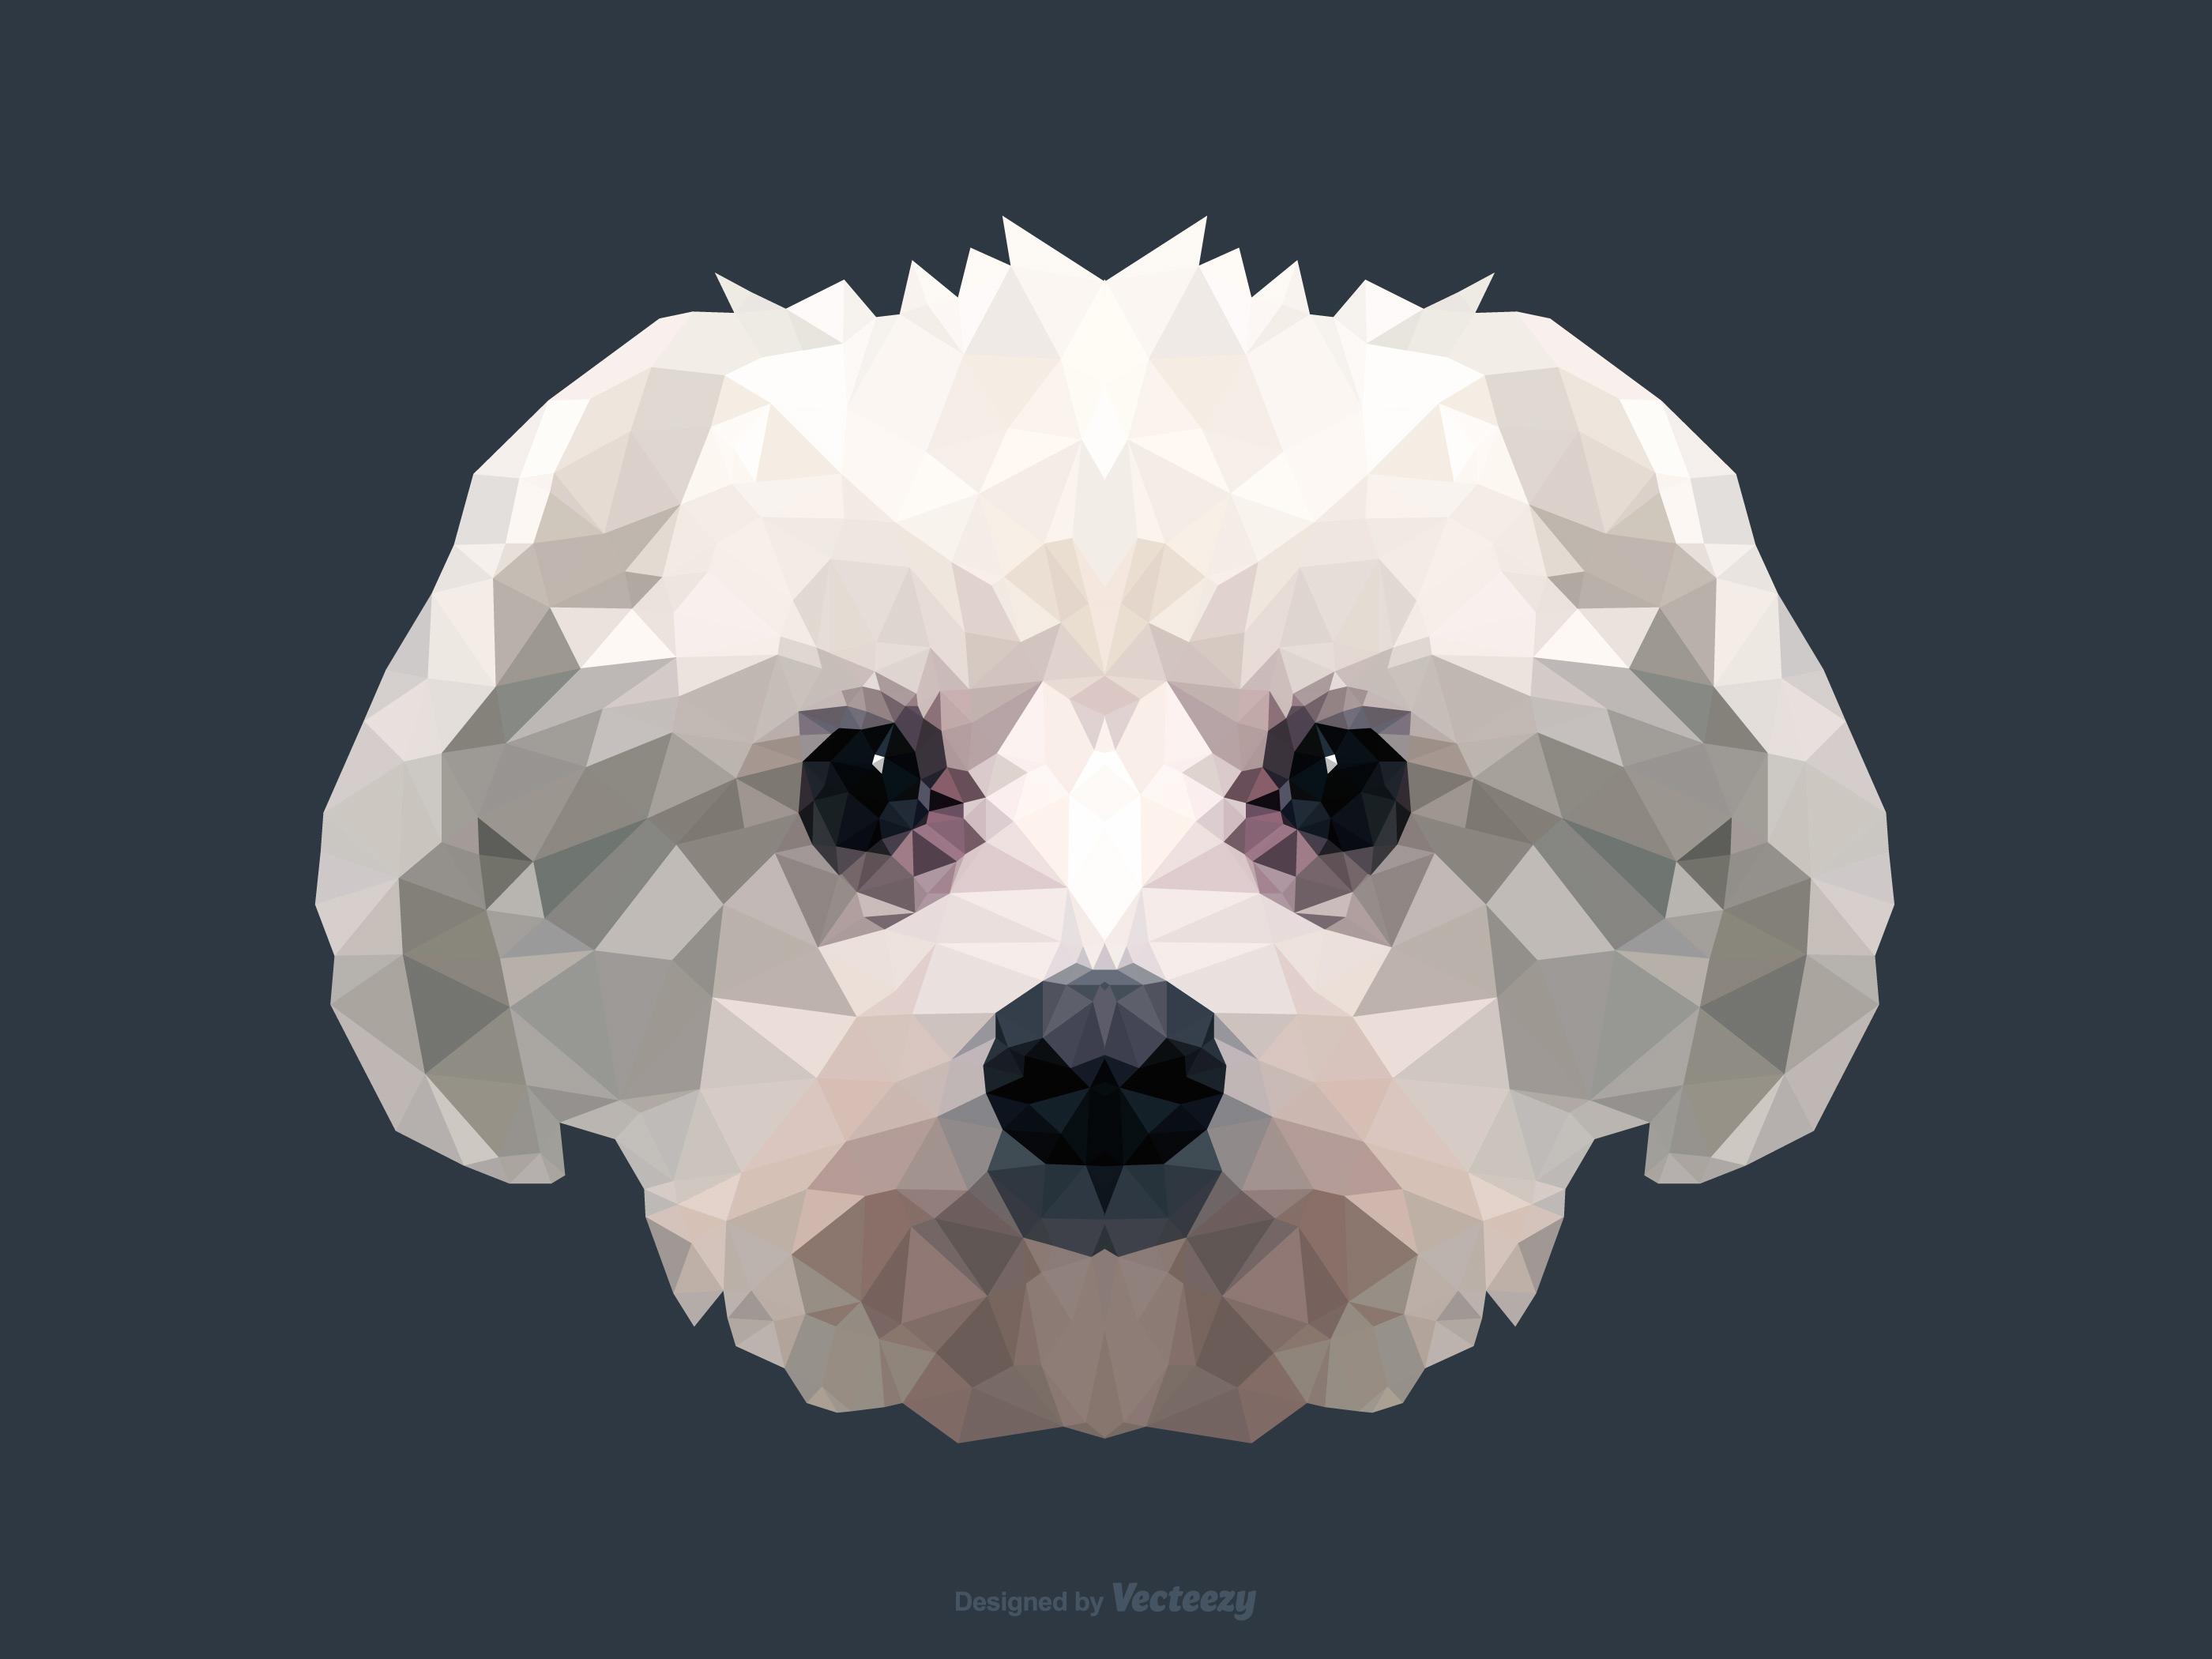 White maltese dog clipart banner library library Maltese Dog Free Vector Art - (3 Free Downloads) banner library library